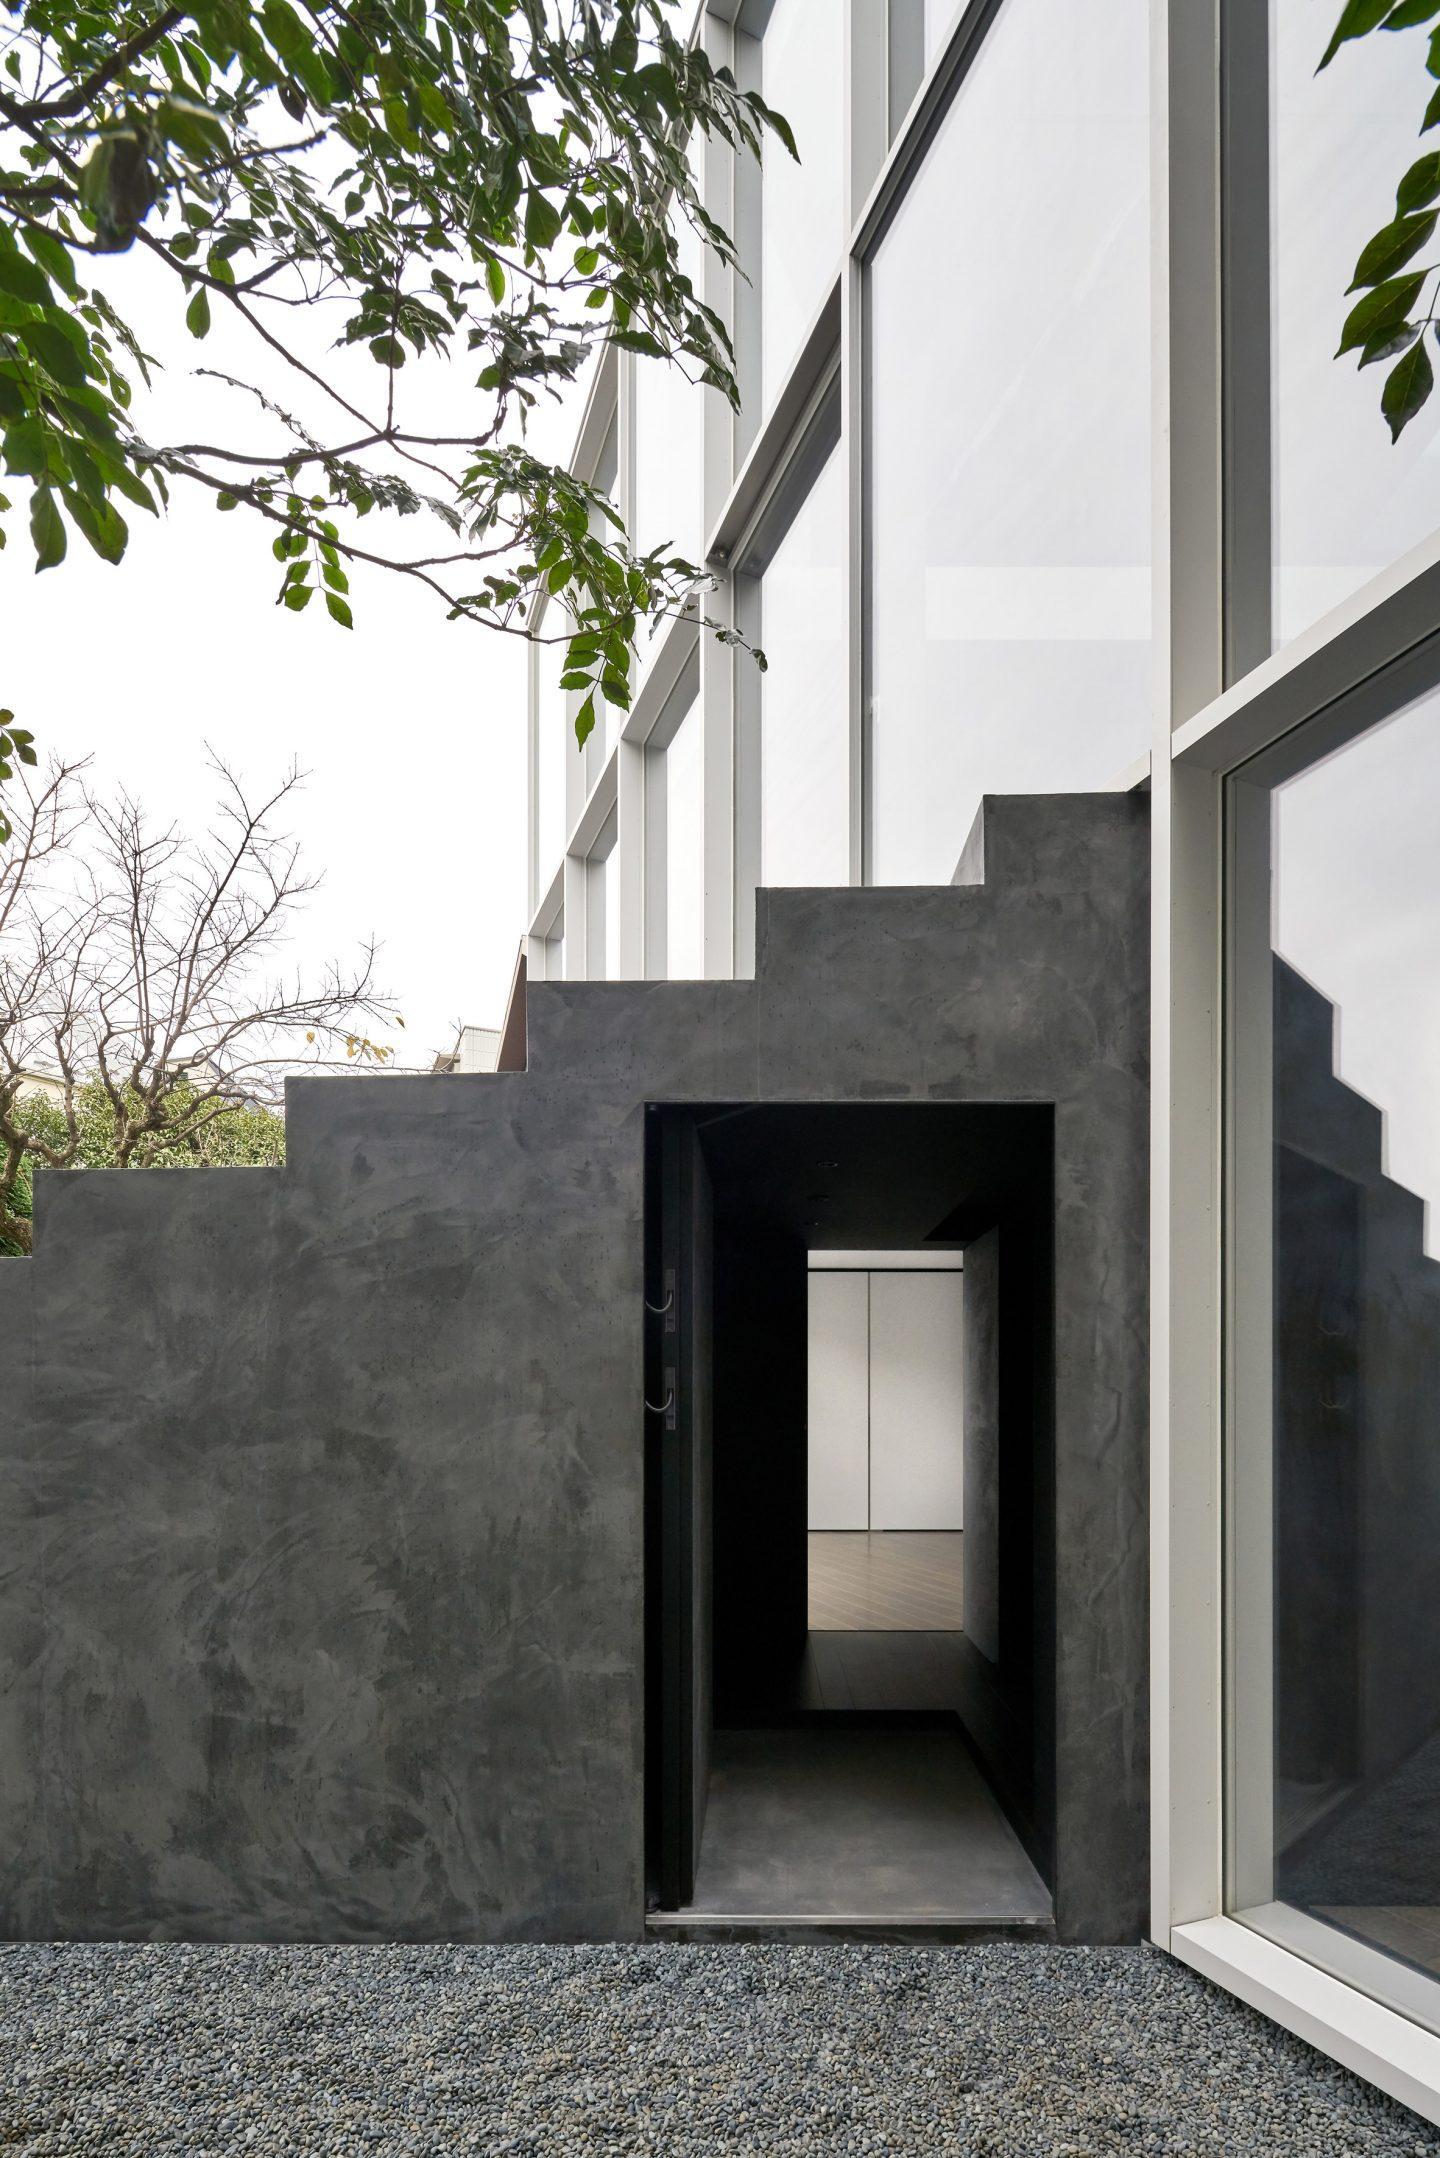 IGNANT-Architecture-Nendo-Stairway-House-08